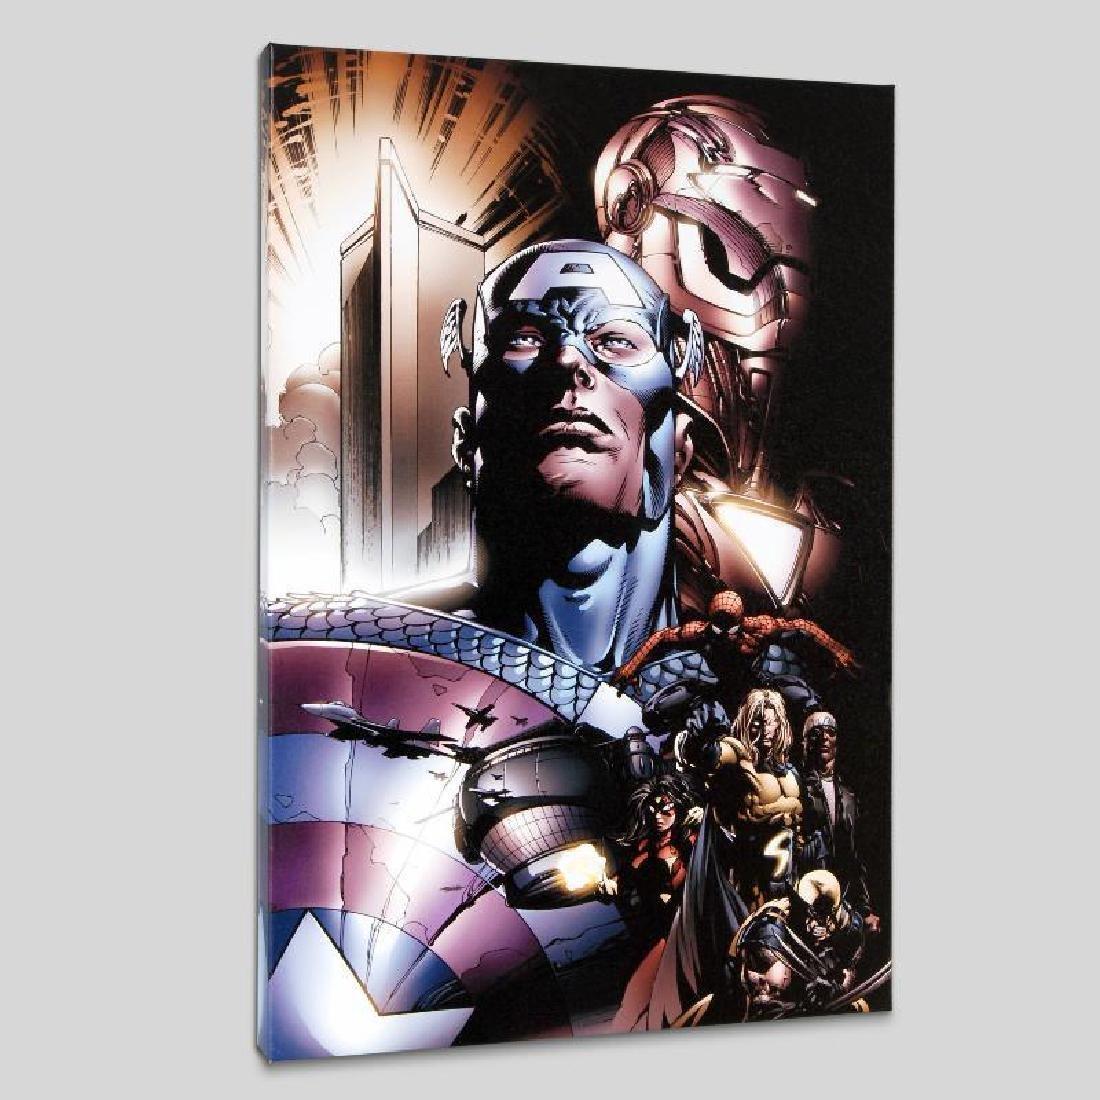 New Avengers #6 by Marvel Comics - 3